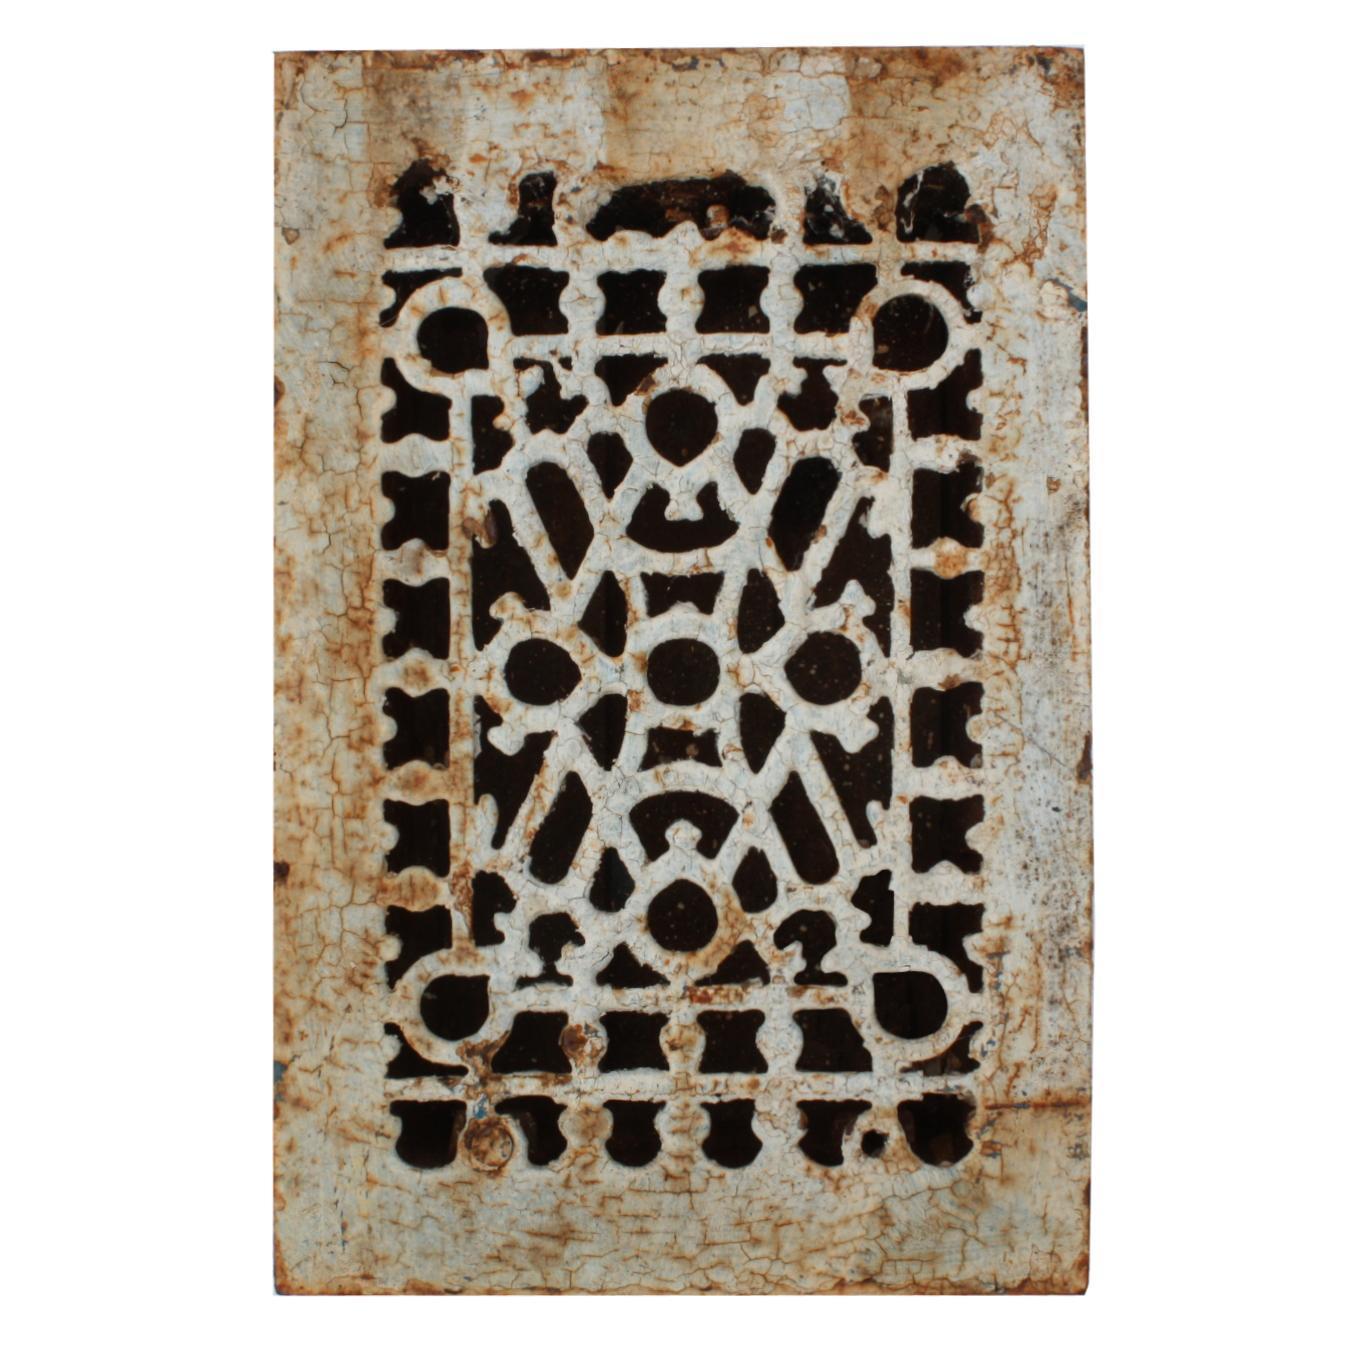 Abstract Antique Cast Iron Heat Register